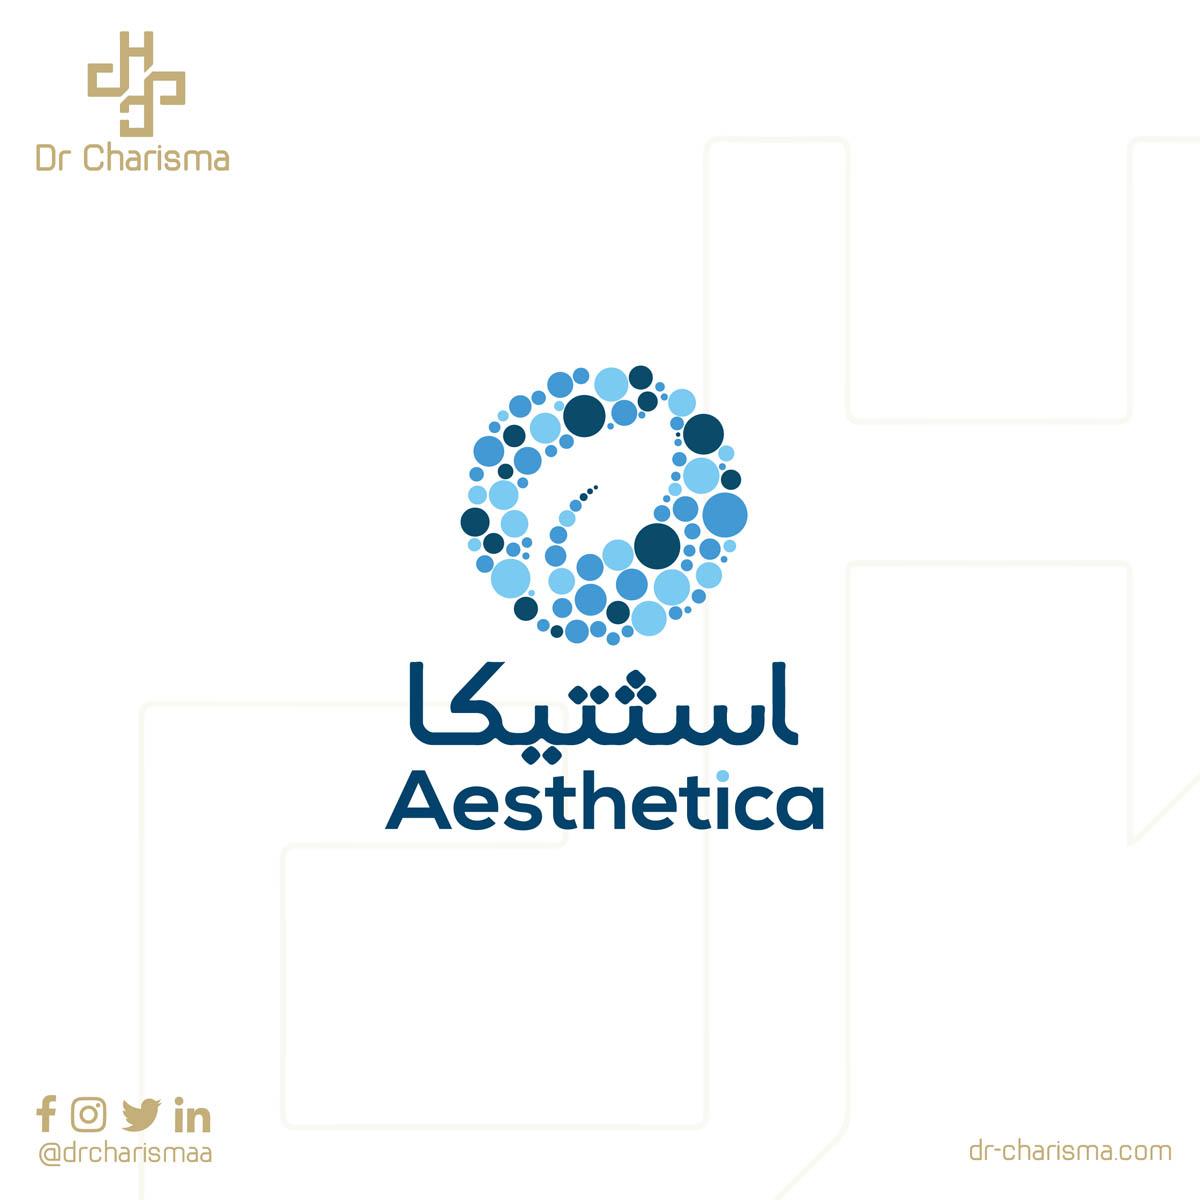 Aesthetica Clinic